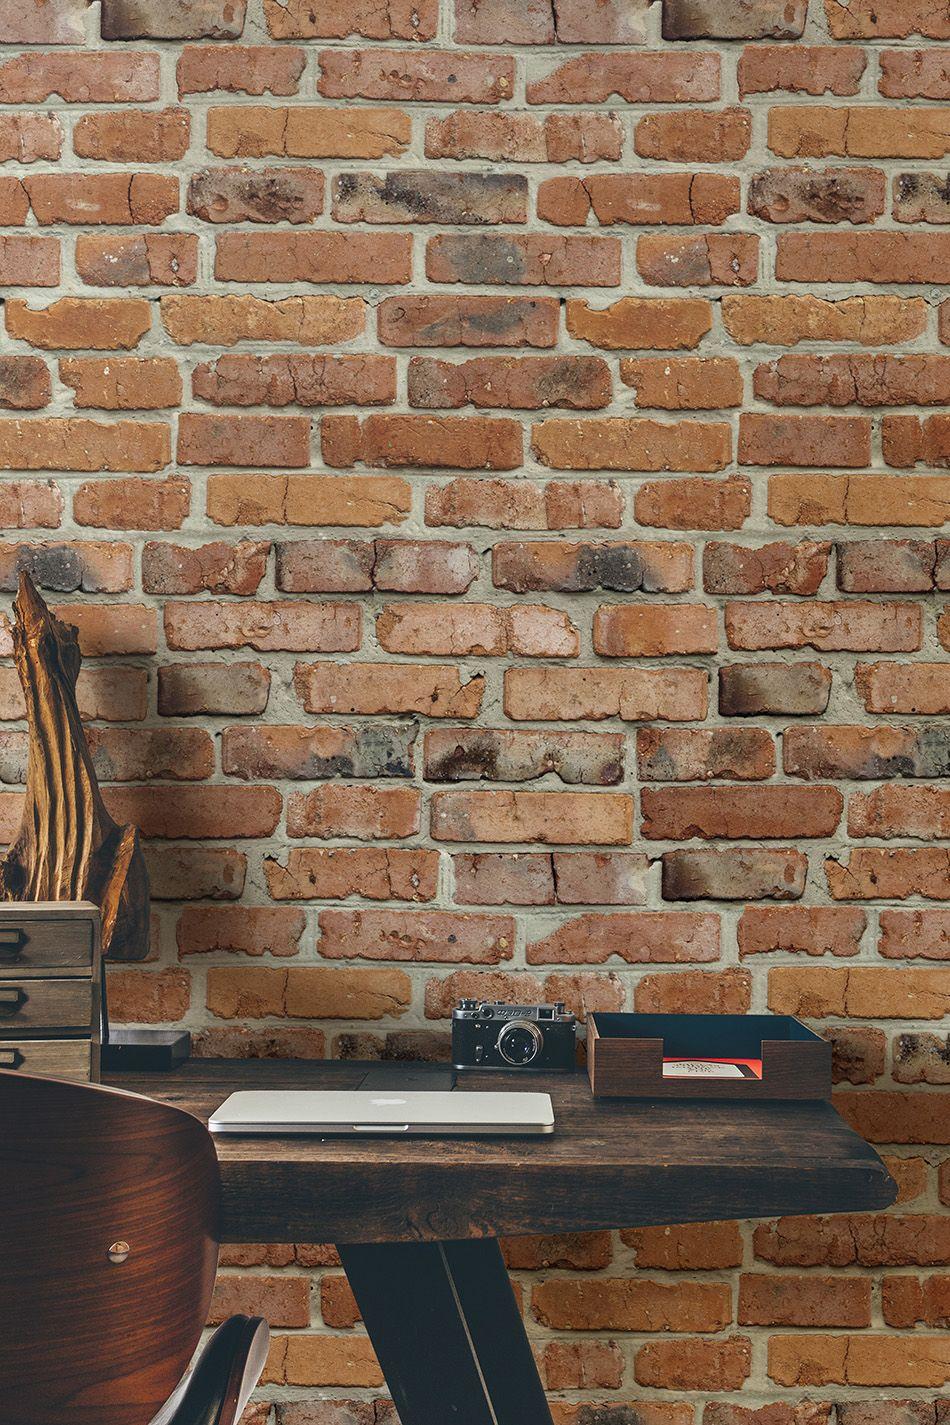 Papeles Pintados Sorprendentes Ladrillo Miltonking Jpg 950 1425  ~ Papel De Pared Imitacion Ladrillo